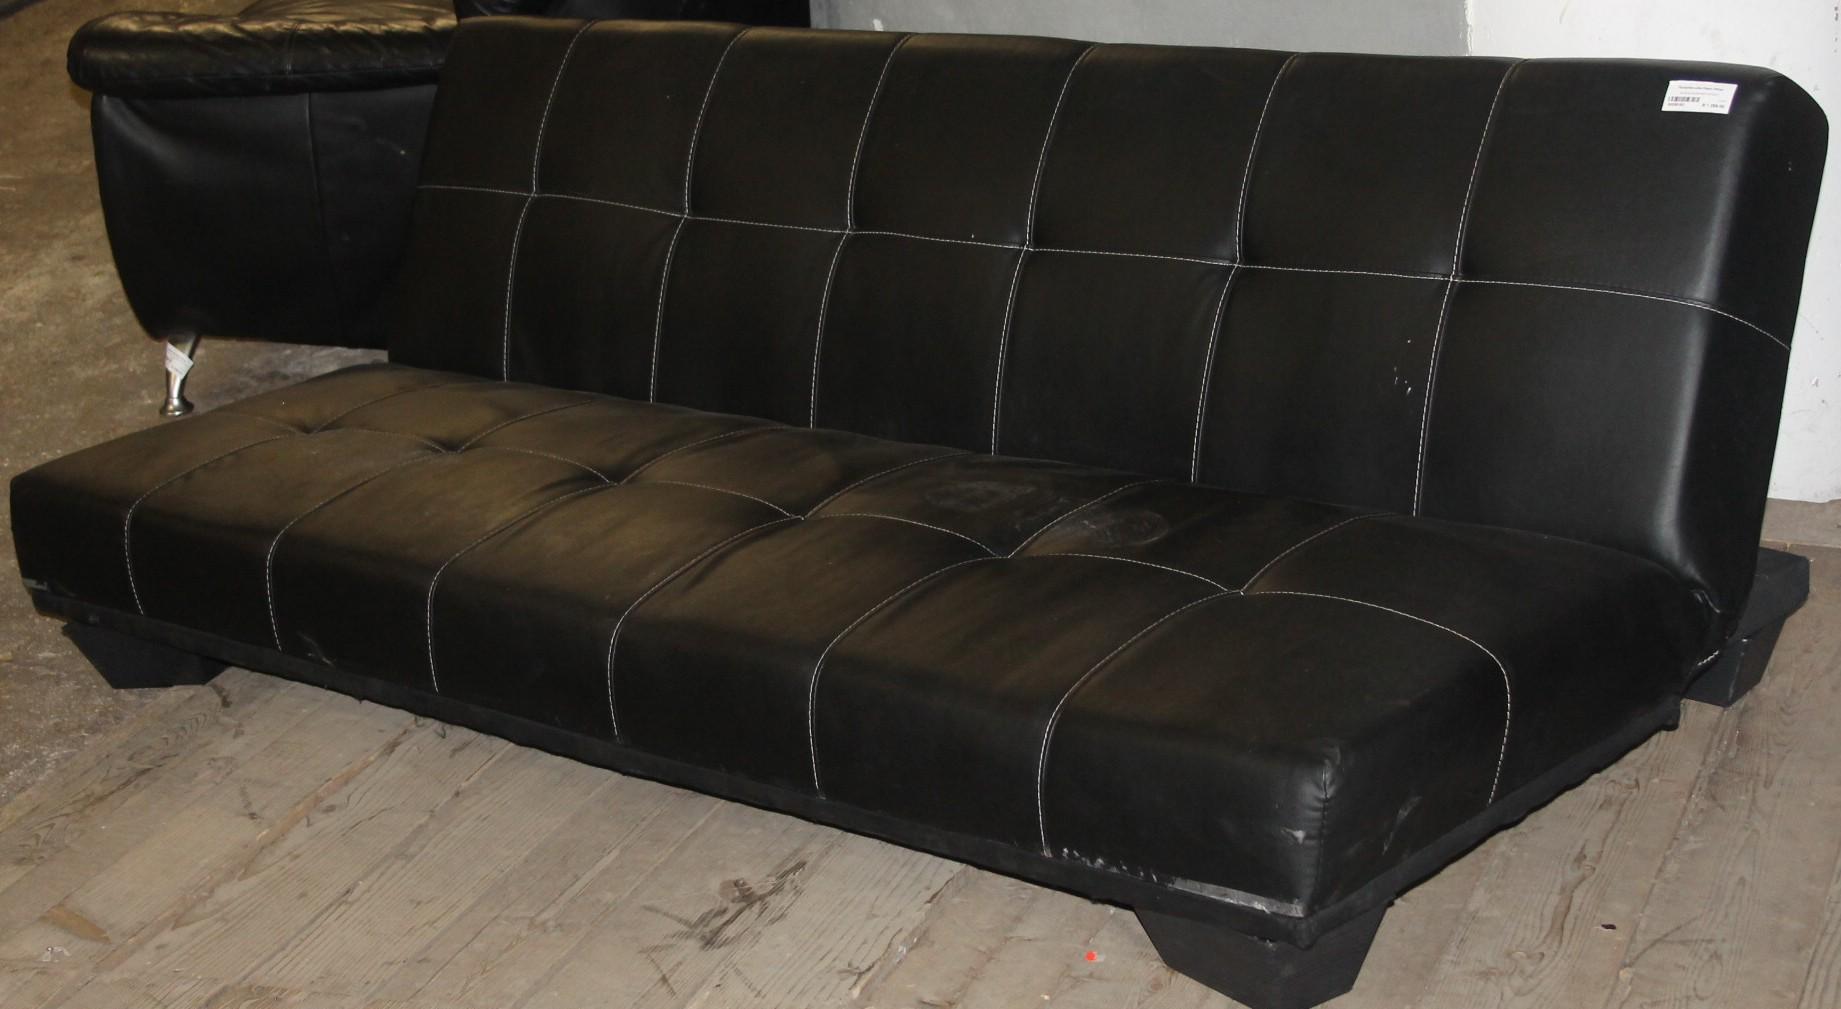 Sleeper couch S028015c #Rosettenvillepawnshop